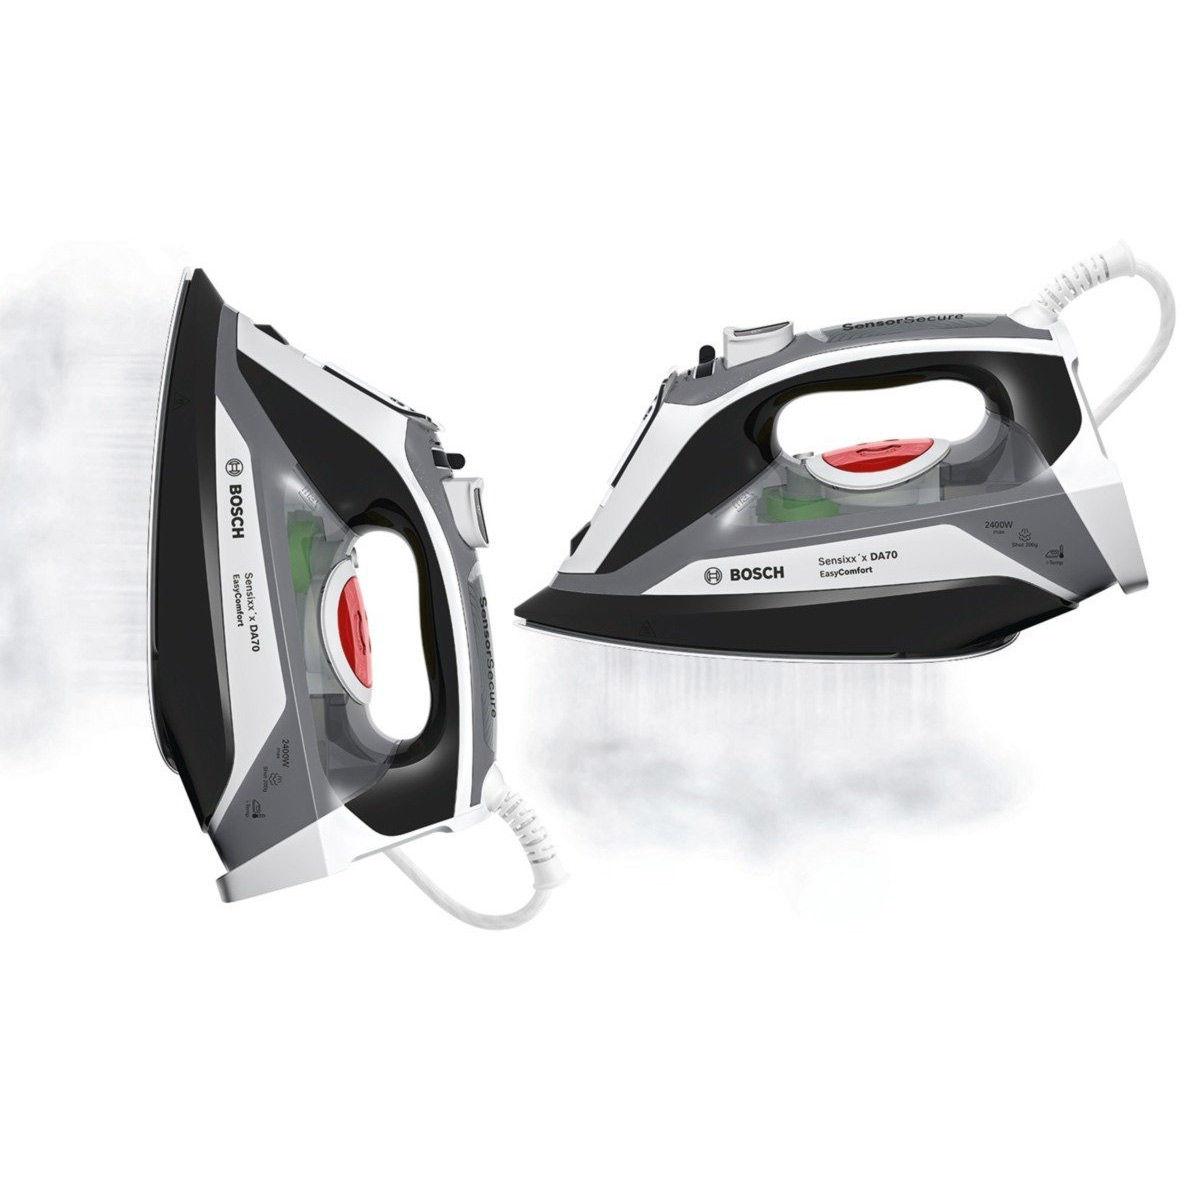 Bosch TDA70EYGB Steam Iron Sensixx x DA70 EasyComfort White   Black 2400W f22d21384e6